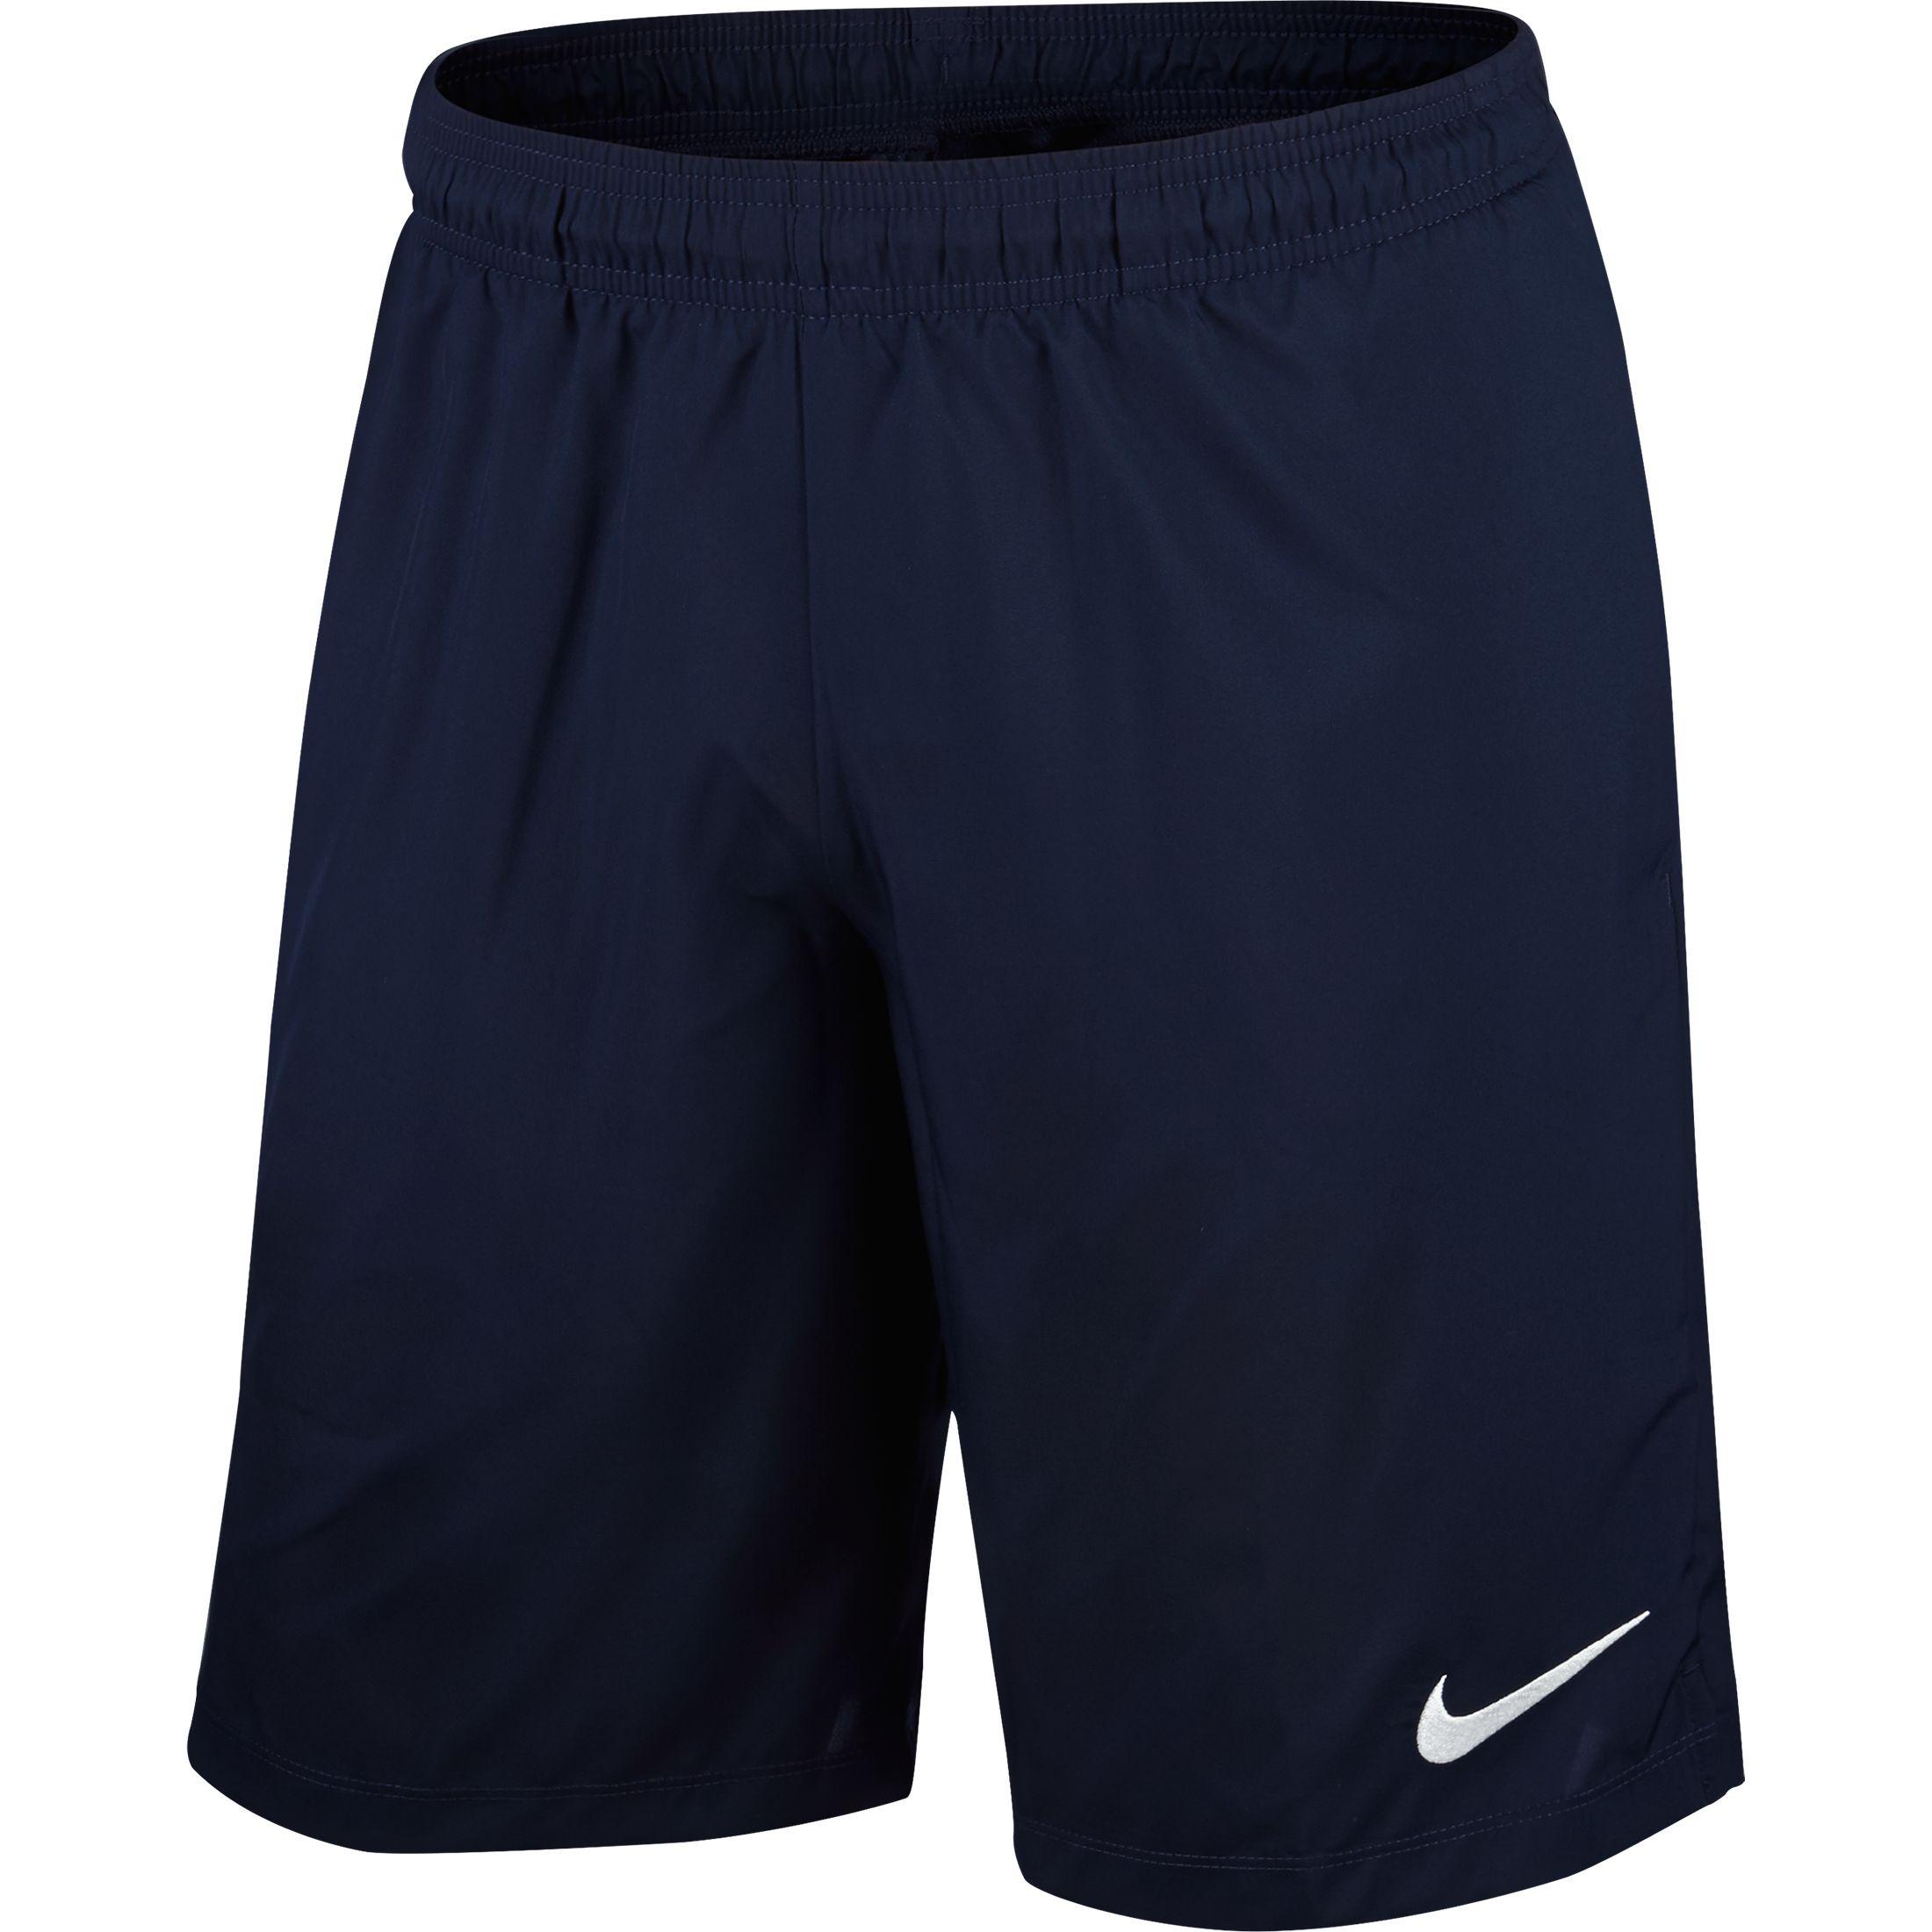 1bf2cd581af3 Short Bleu D hiver Pull Vetement Doudoune Nike Chapka amp  rr5q48w